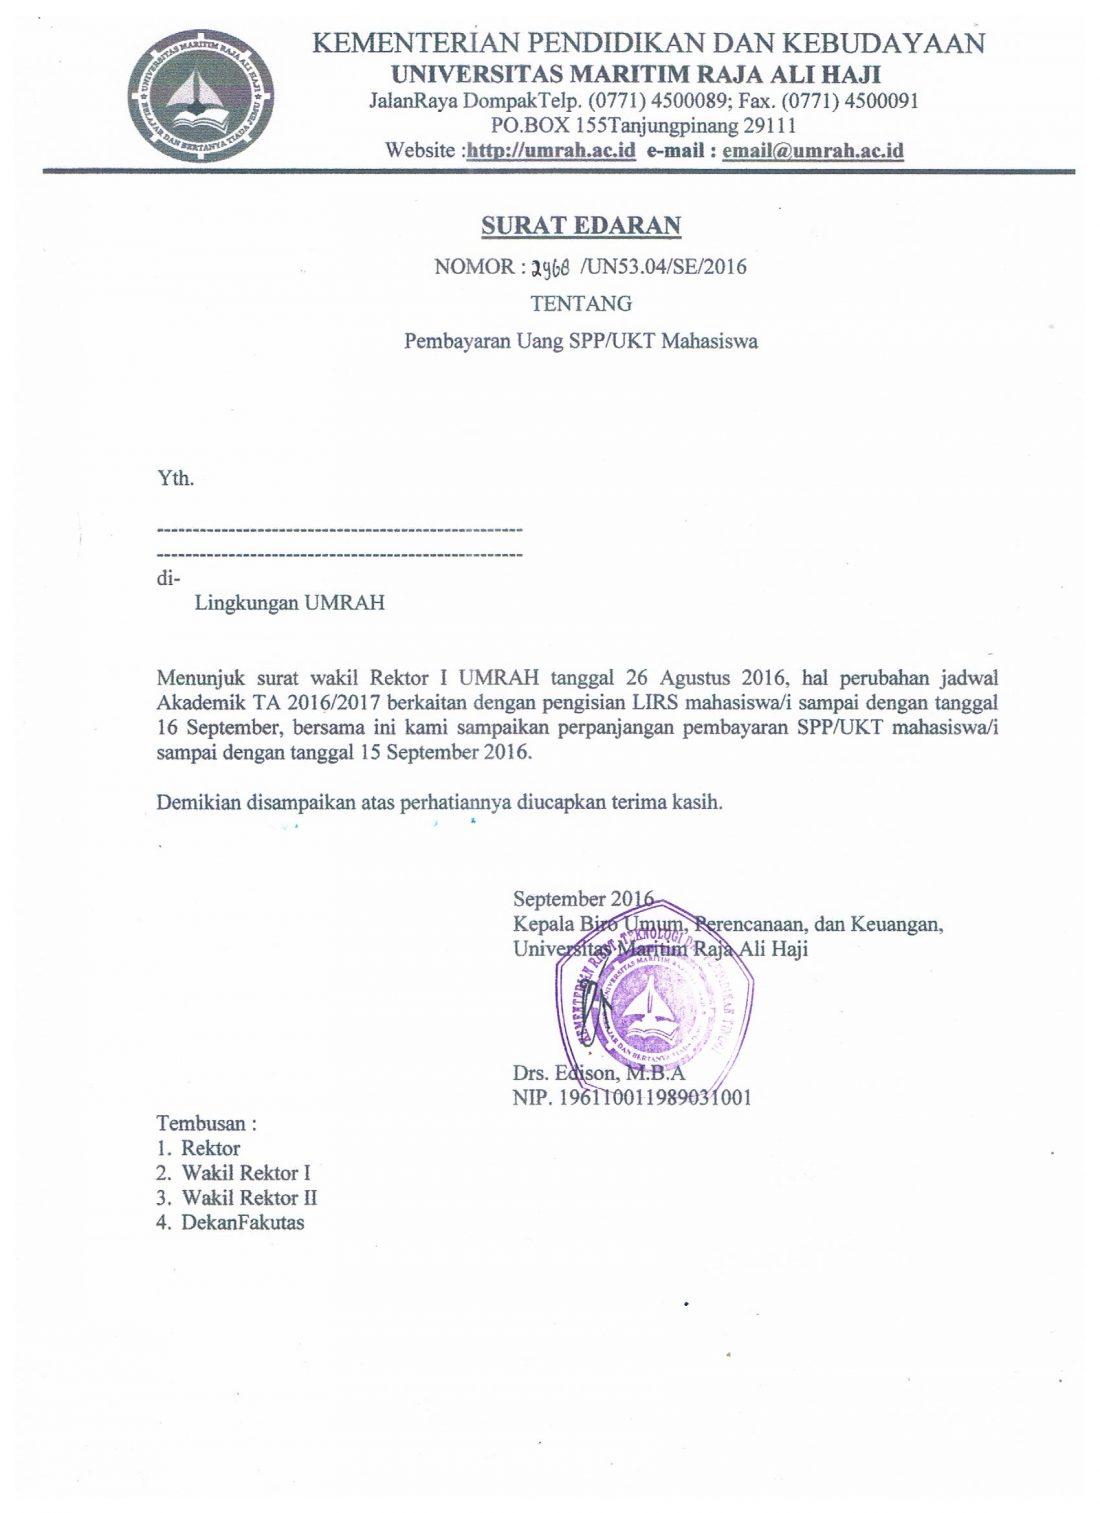 Surat Edaran Pembayaran UKT/SPP